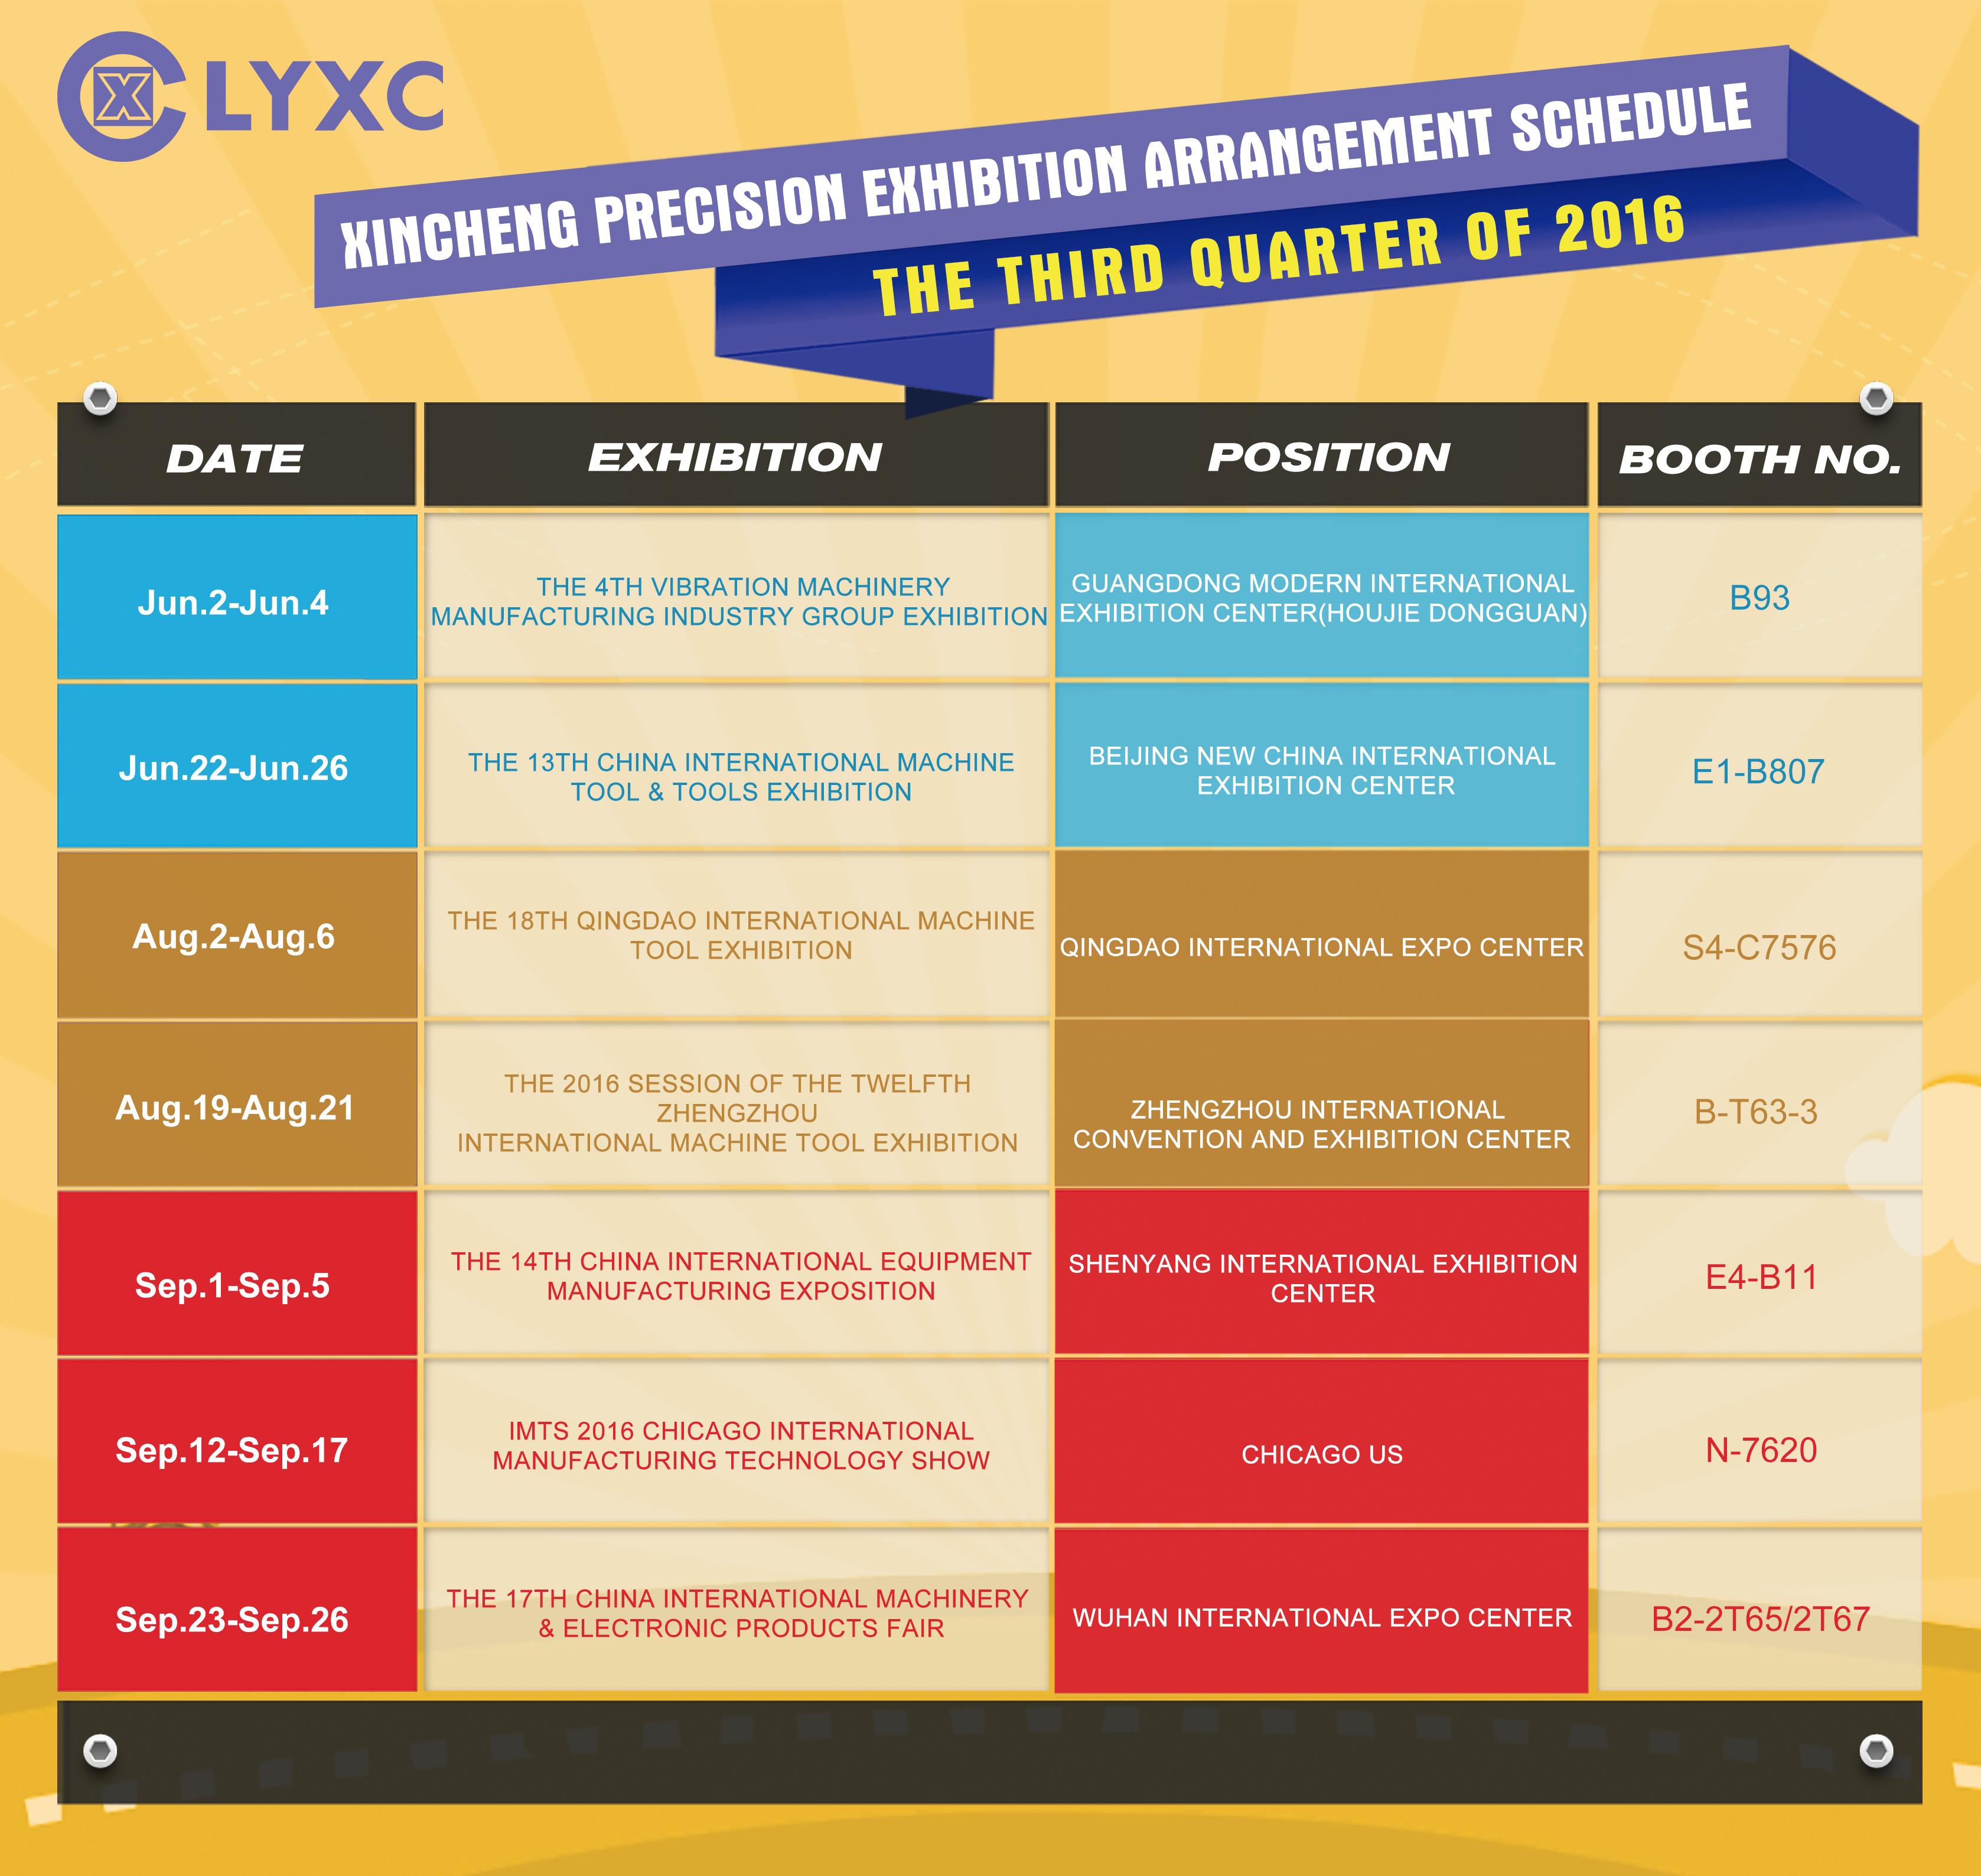 XINCHENG PRECISION | The Third Quarter Exhibition Arrangement Schedule